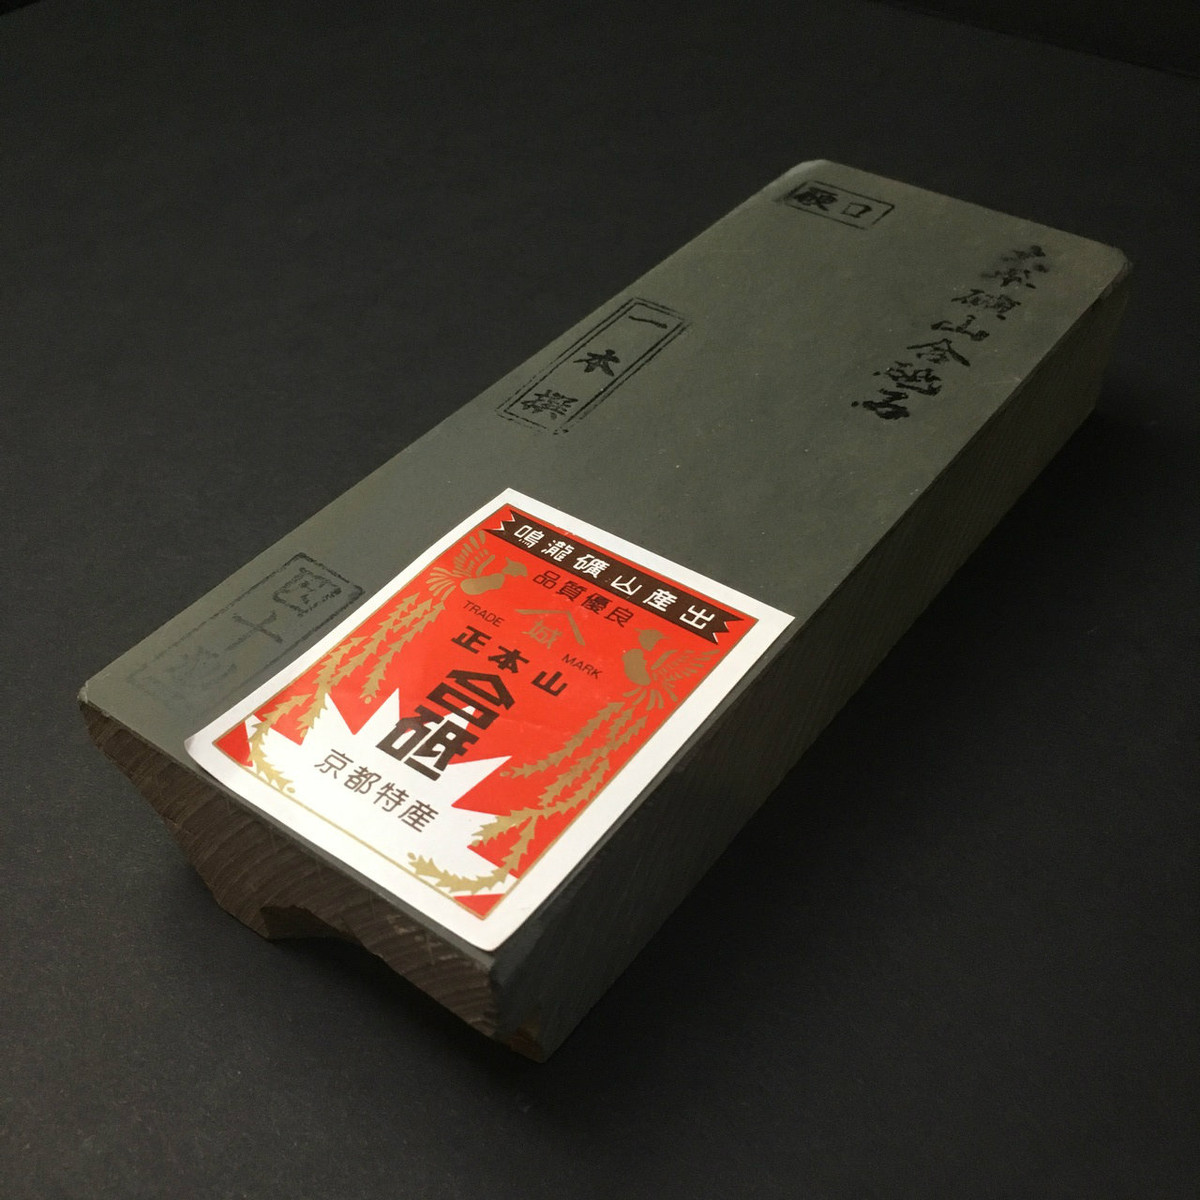 Imanishi Ohira - Stone - Hard